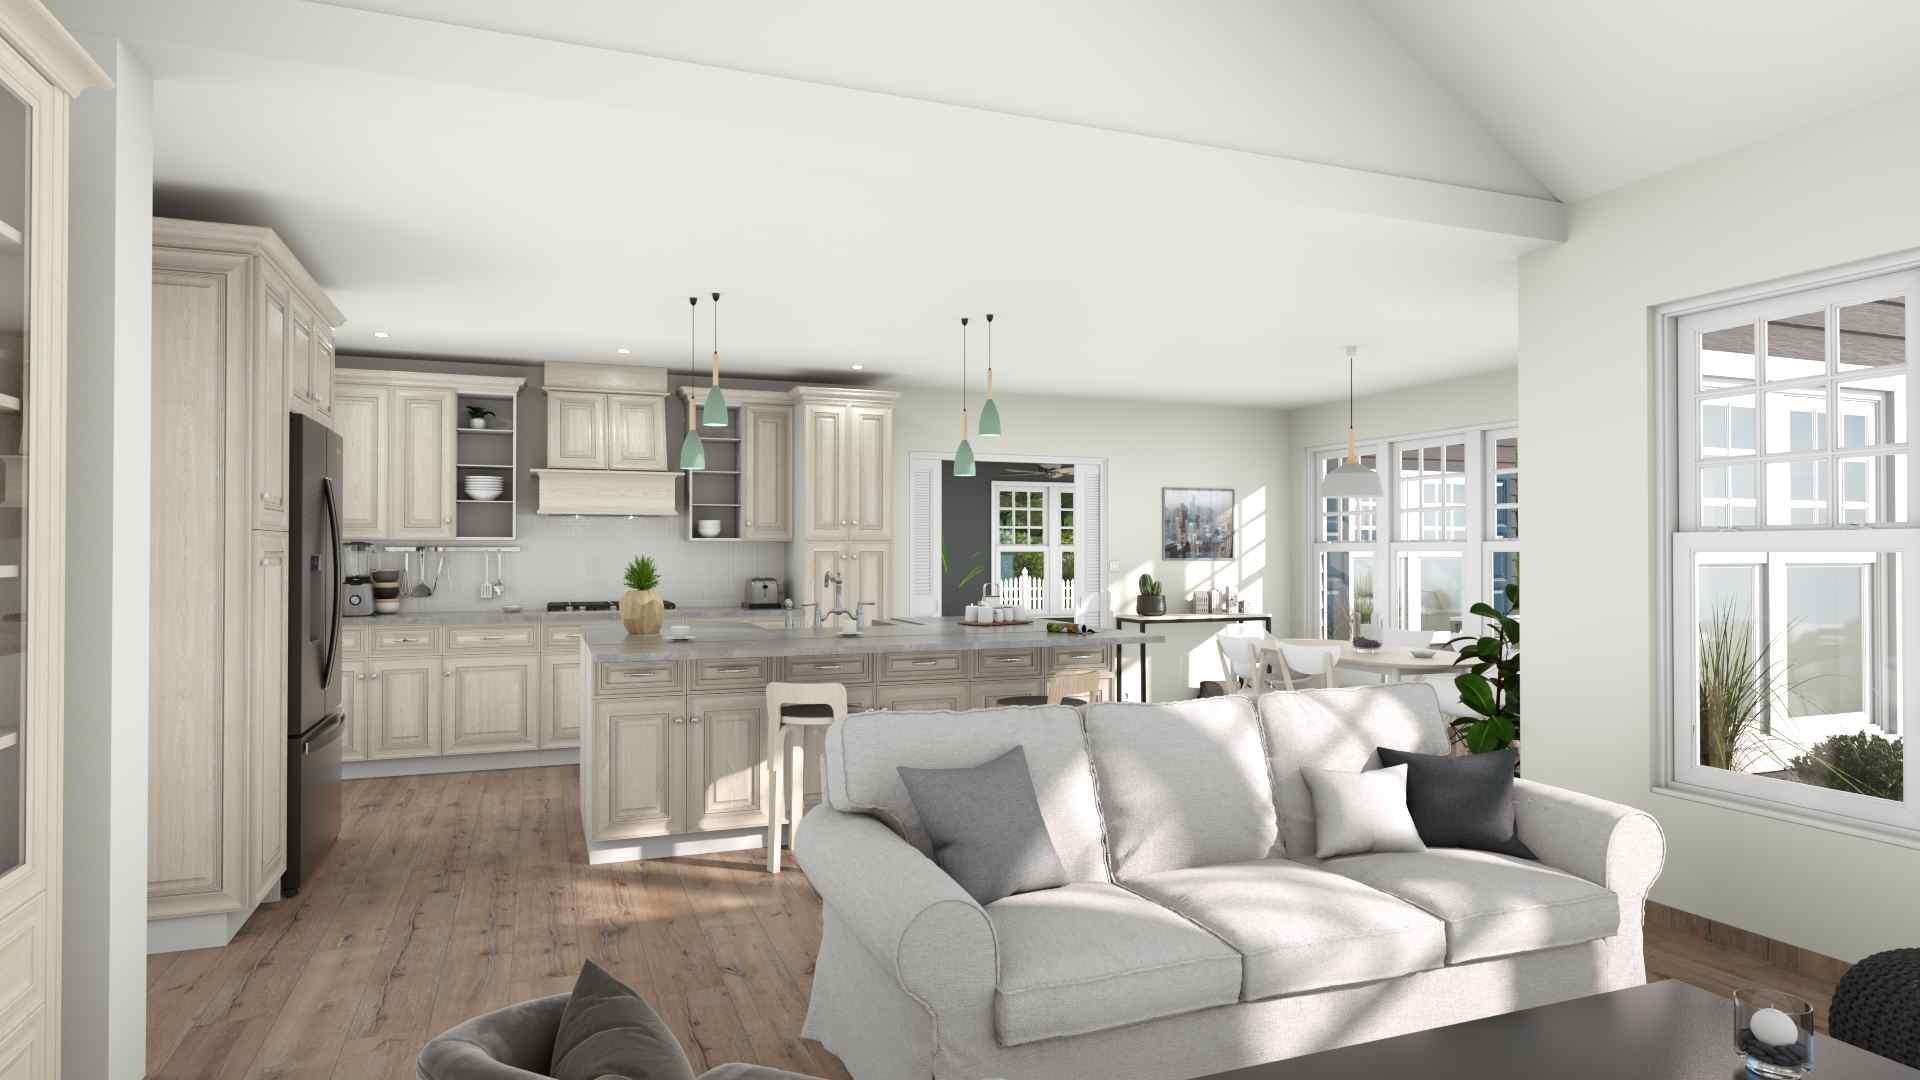 Kitchen and living area vizualization